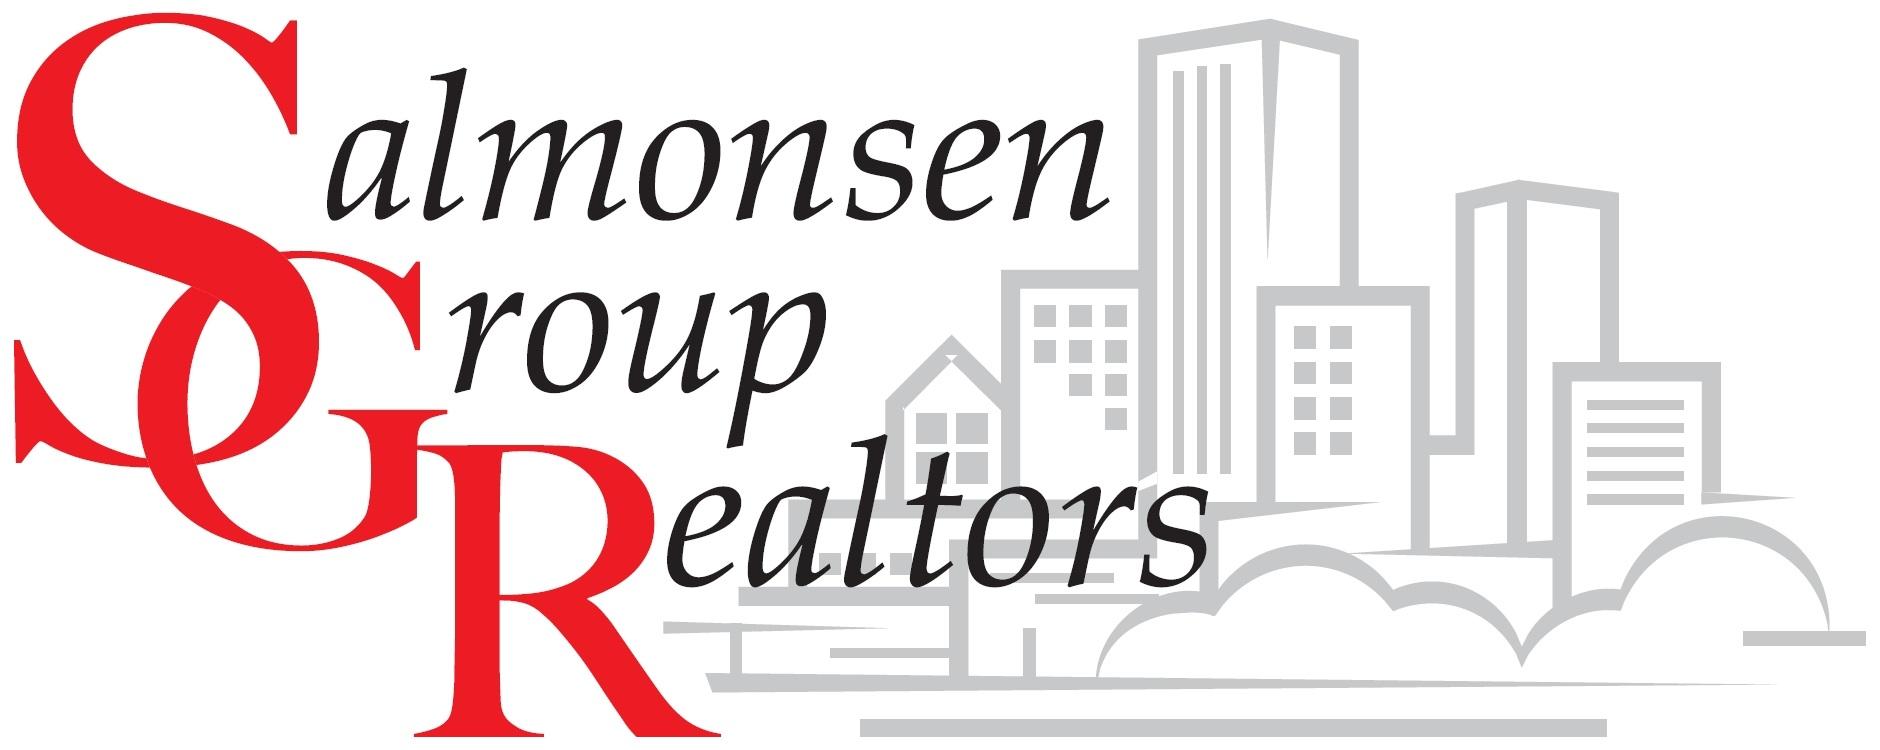 Salmonsen Group Realtors - KW COMMERCIAL